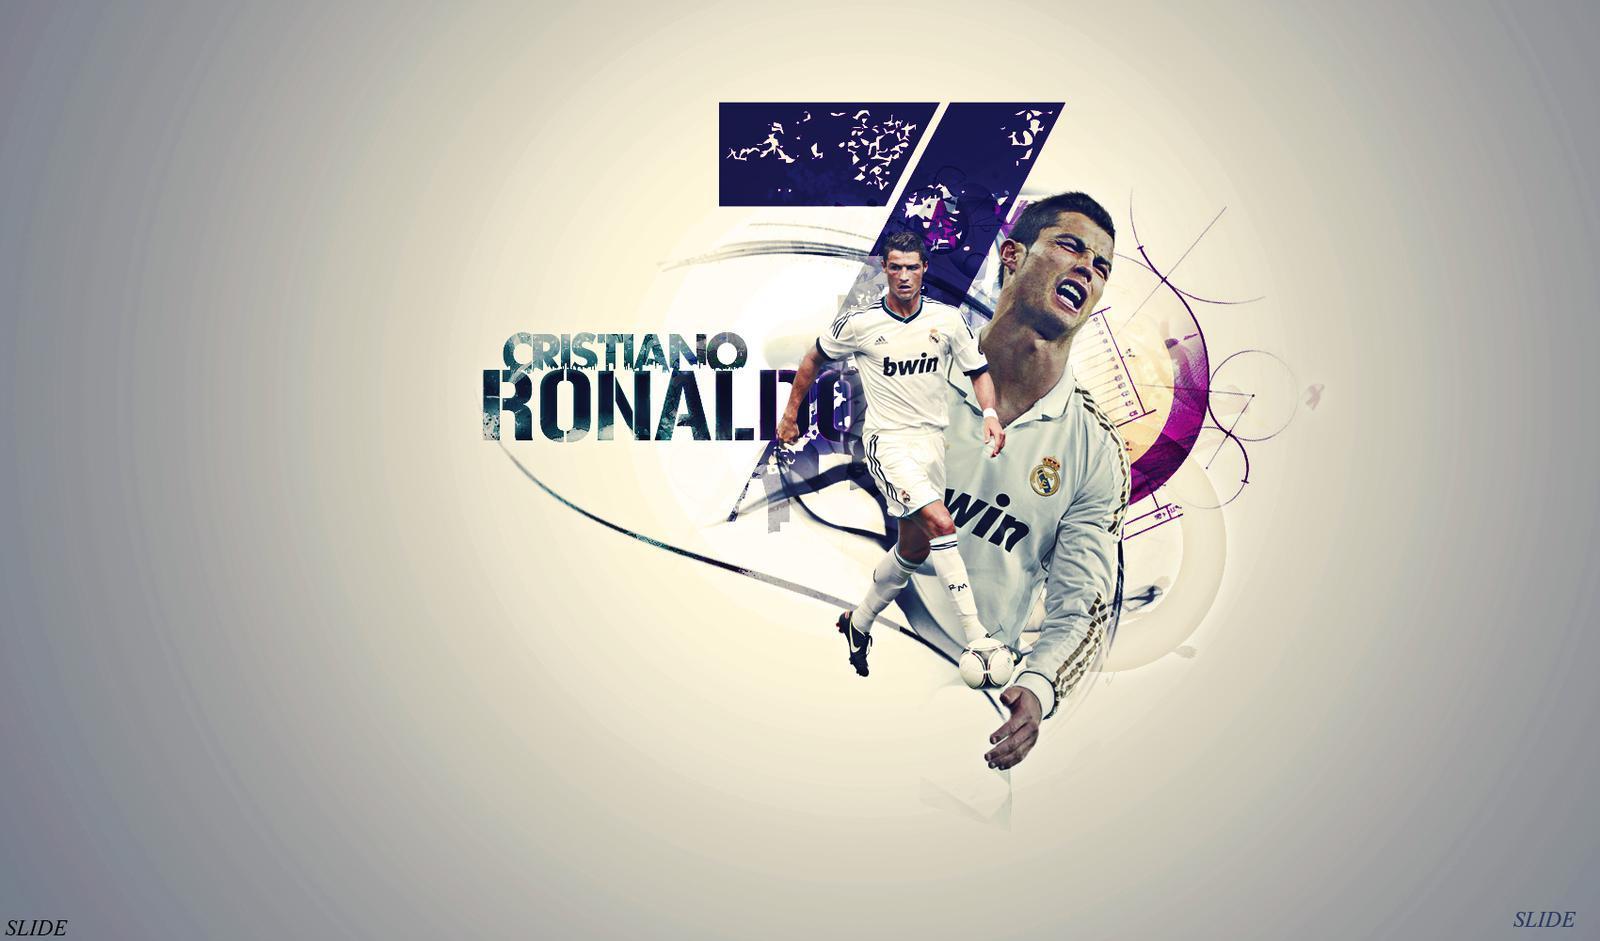 Cristiano Ronaldo 7 Wallpapers 2015 1600x941